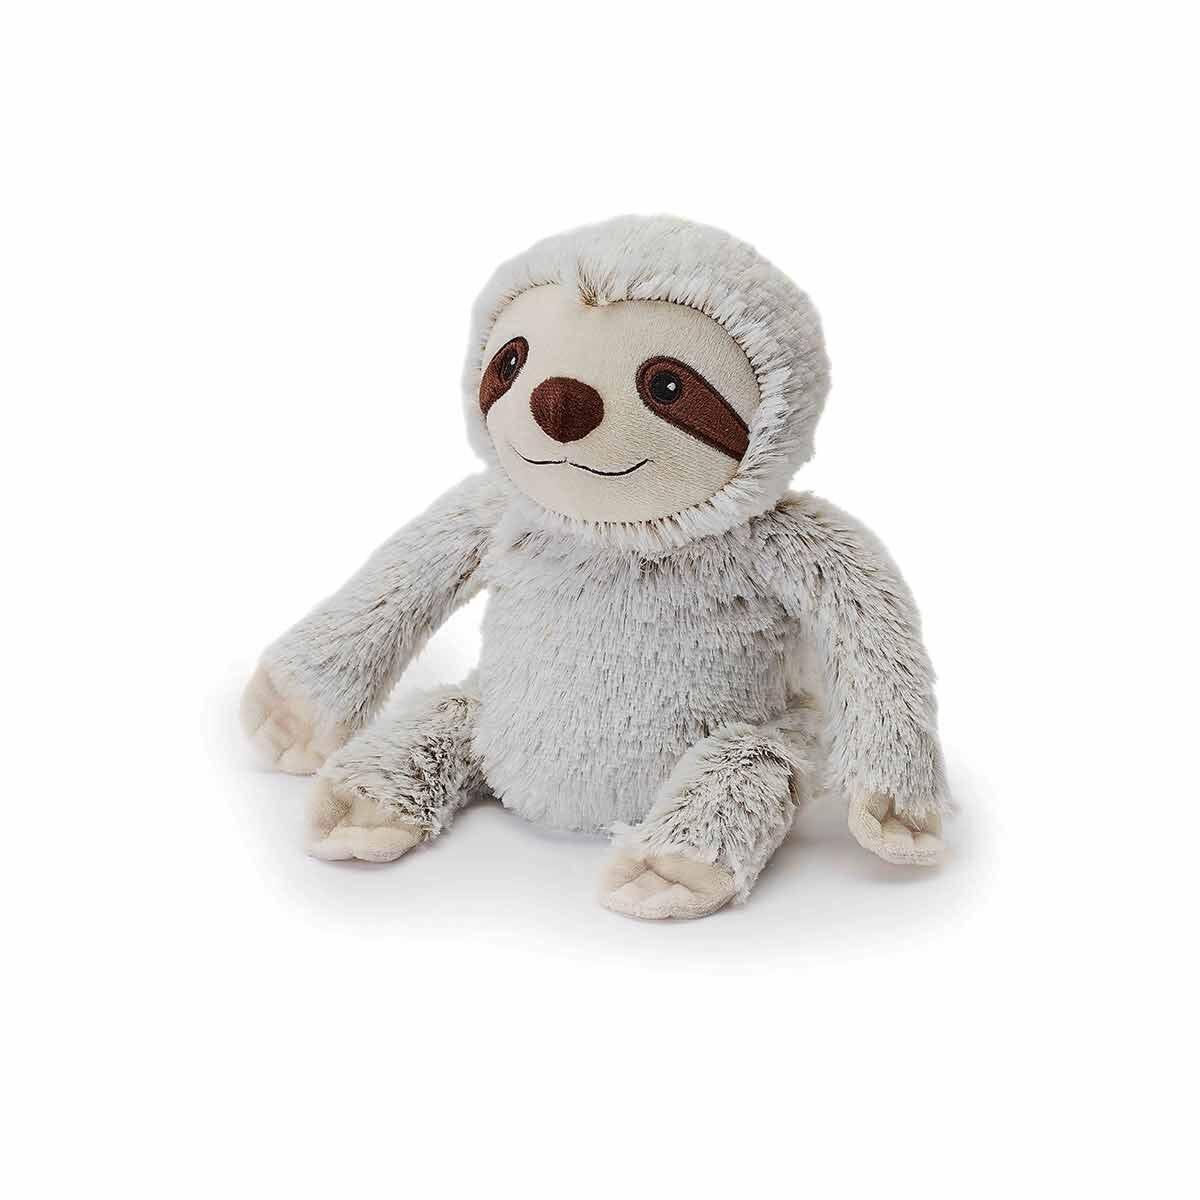 Warmies Marshmallow Sloth Microwaveable Toy